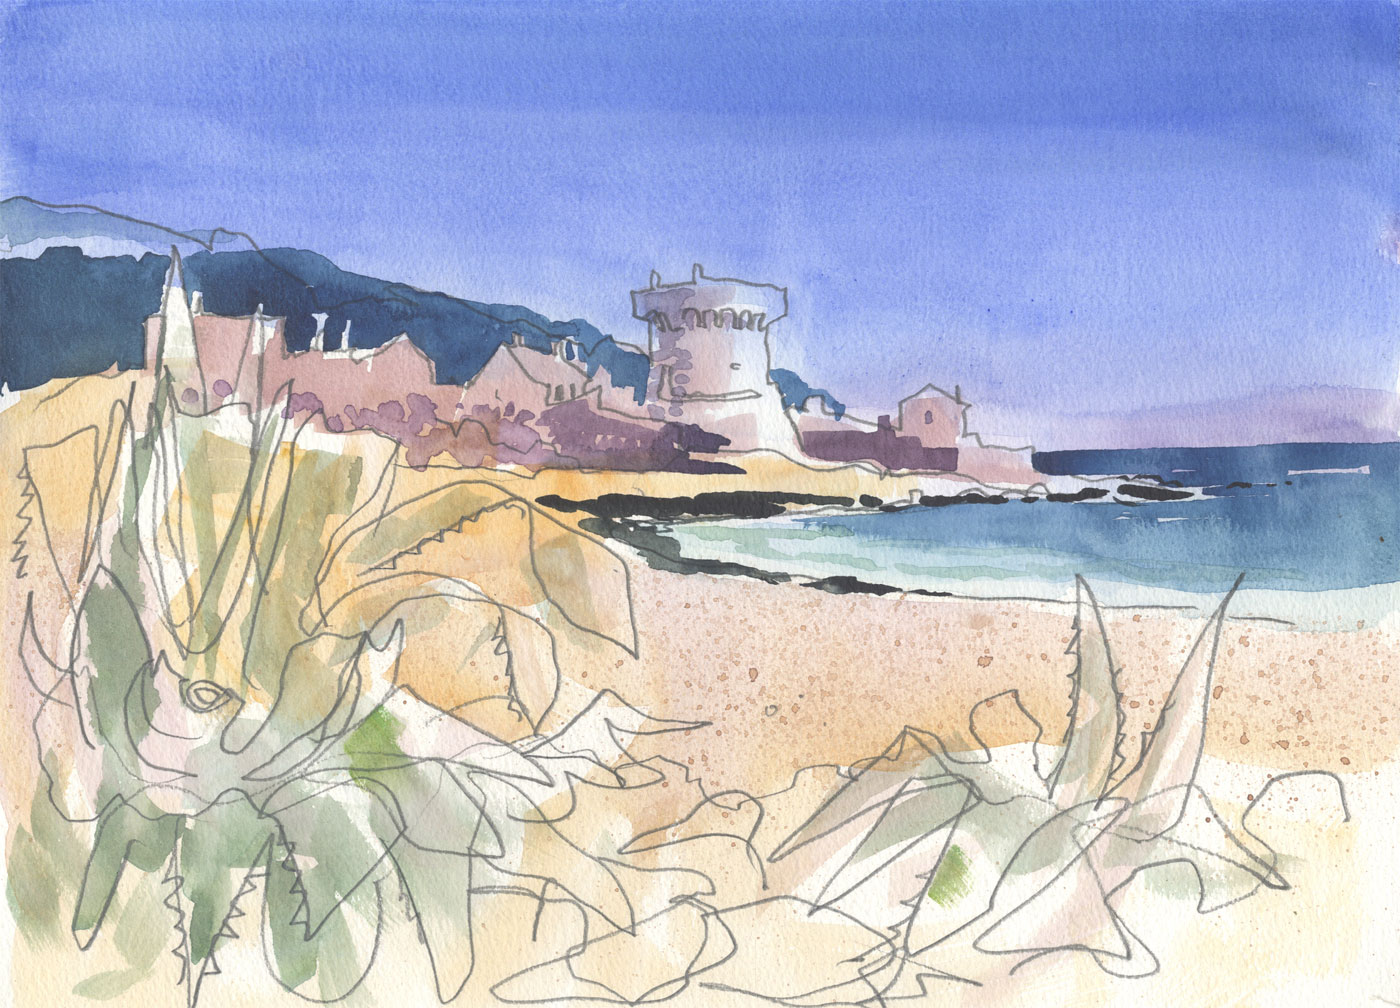 Robert T. Blayney (1929-2016) - Mid 20th Century Watercolour, Coastal View